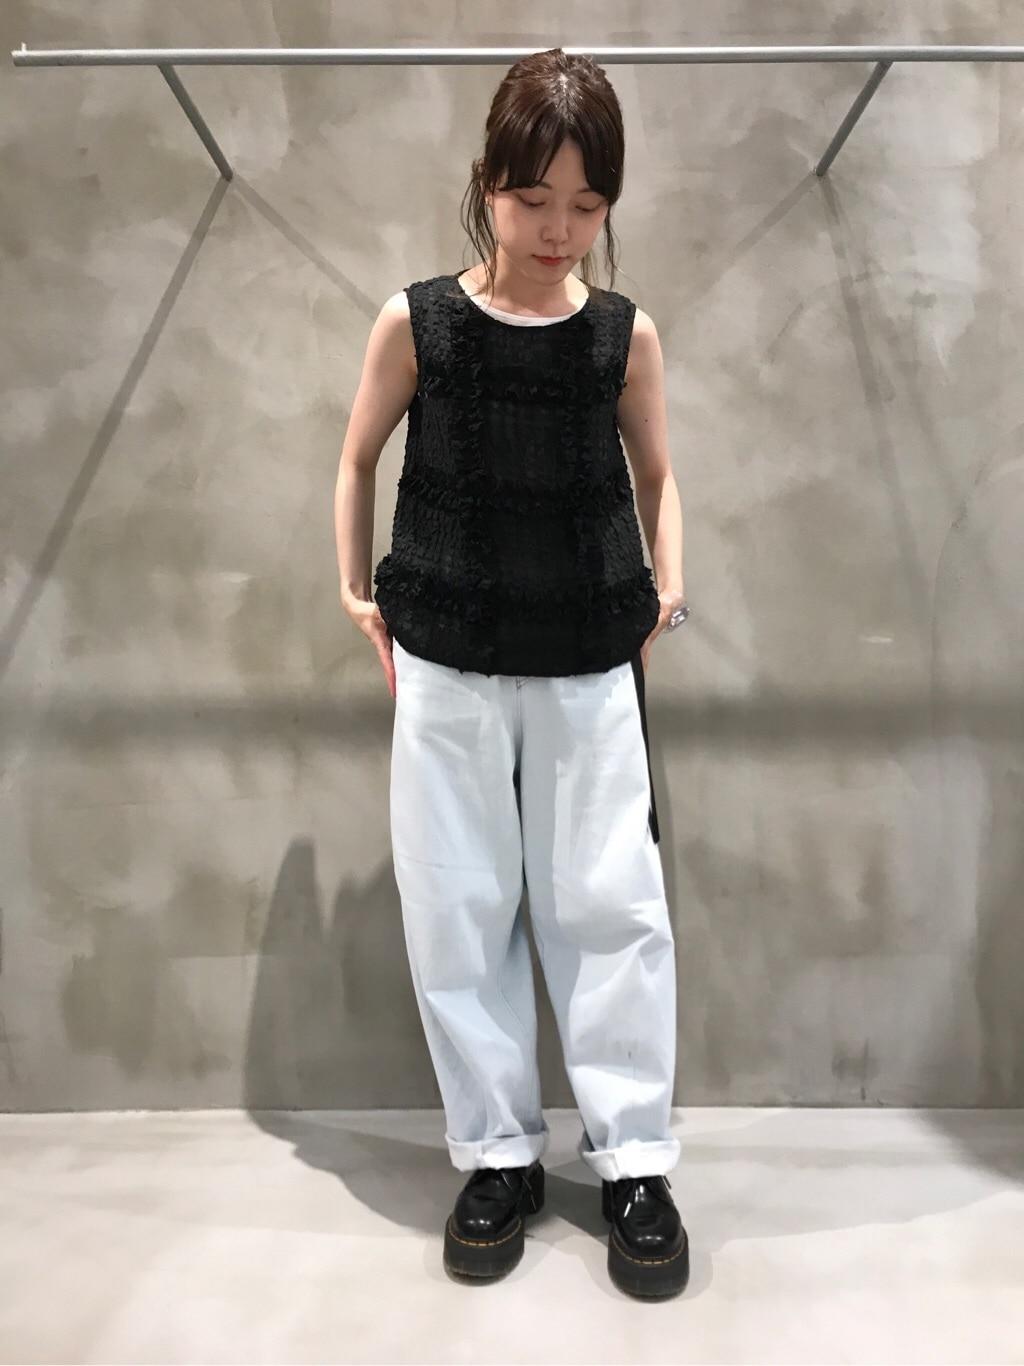 bulle de savon 渋谷スクランブルスクエア 身長:153cm 2020.07.03